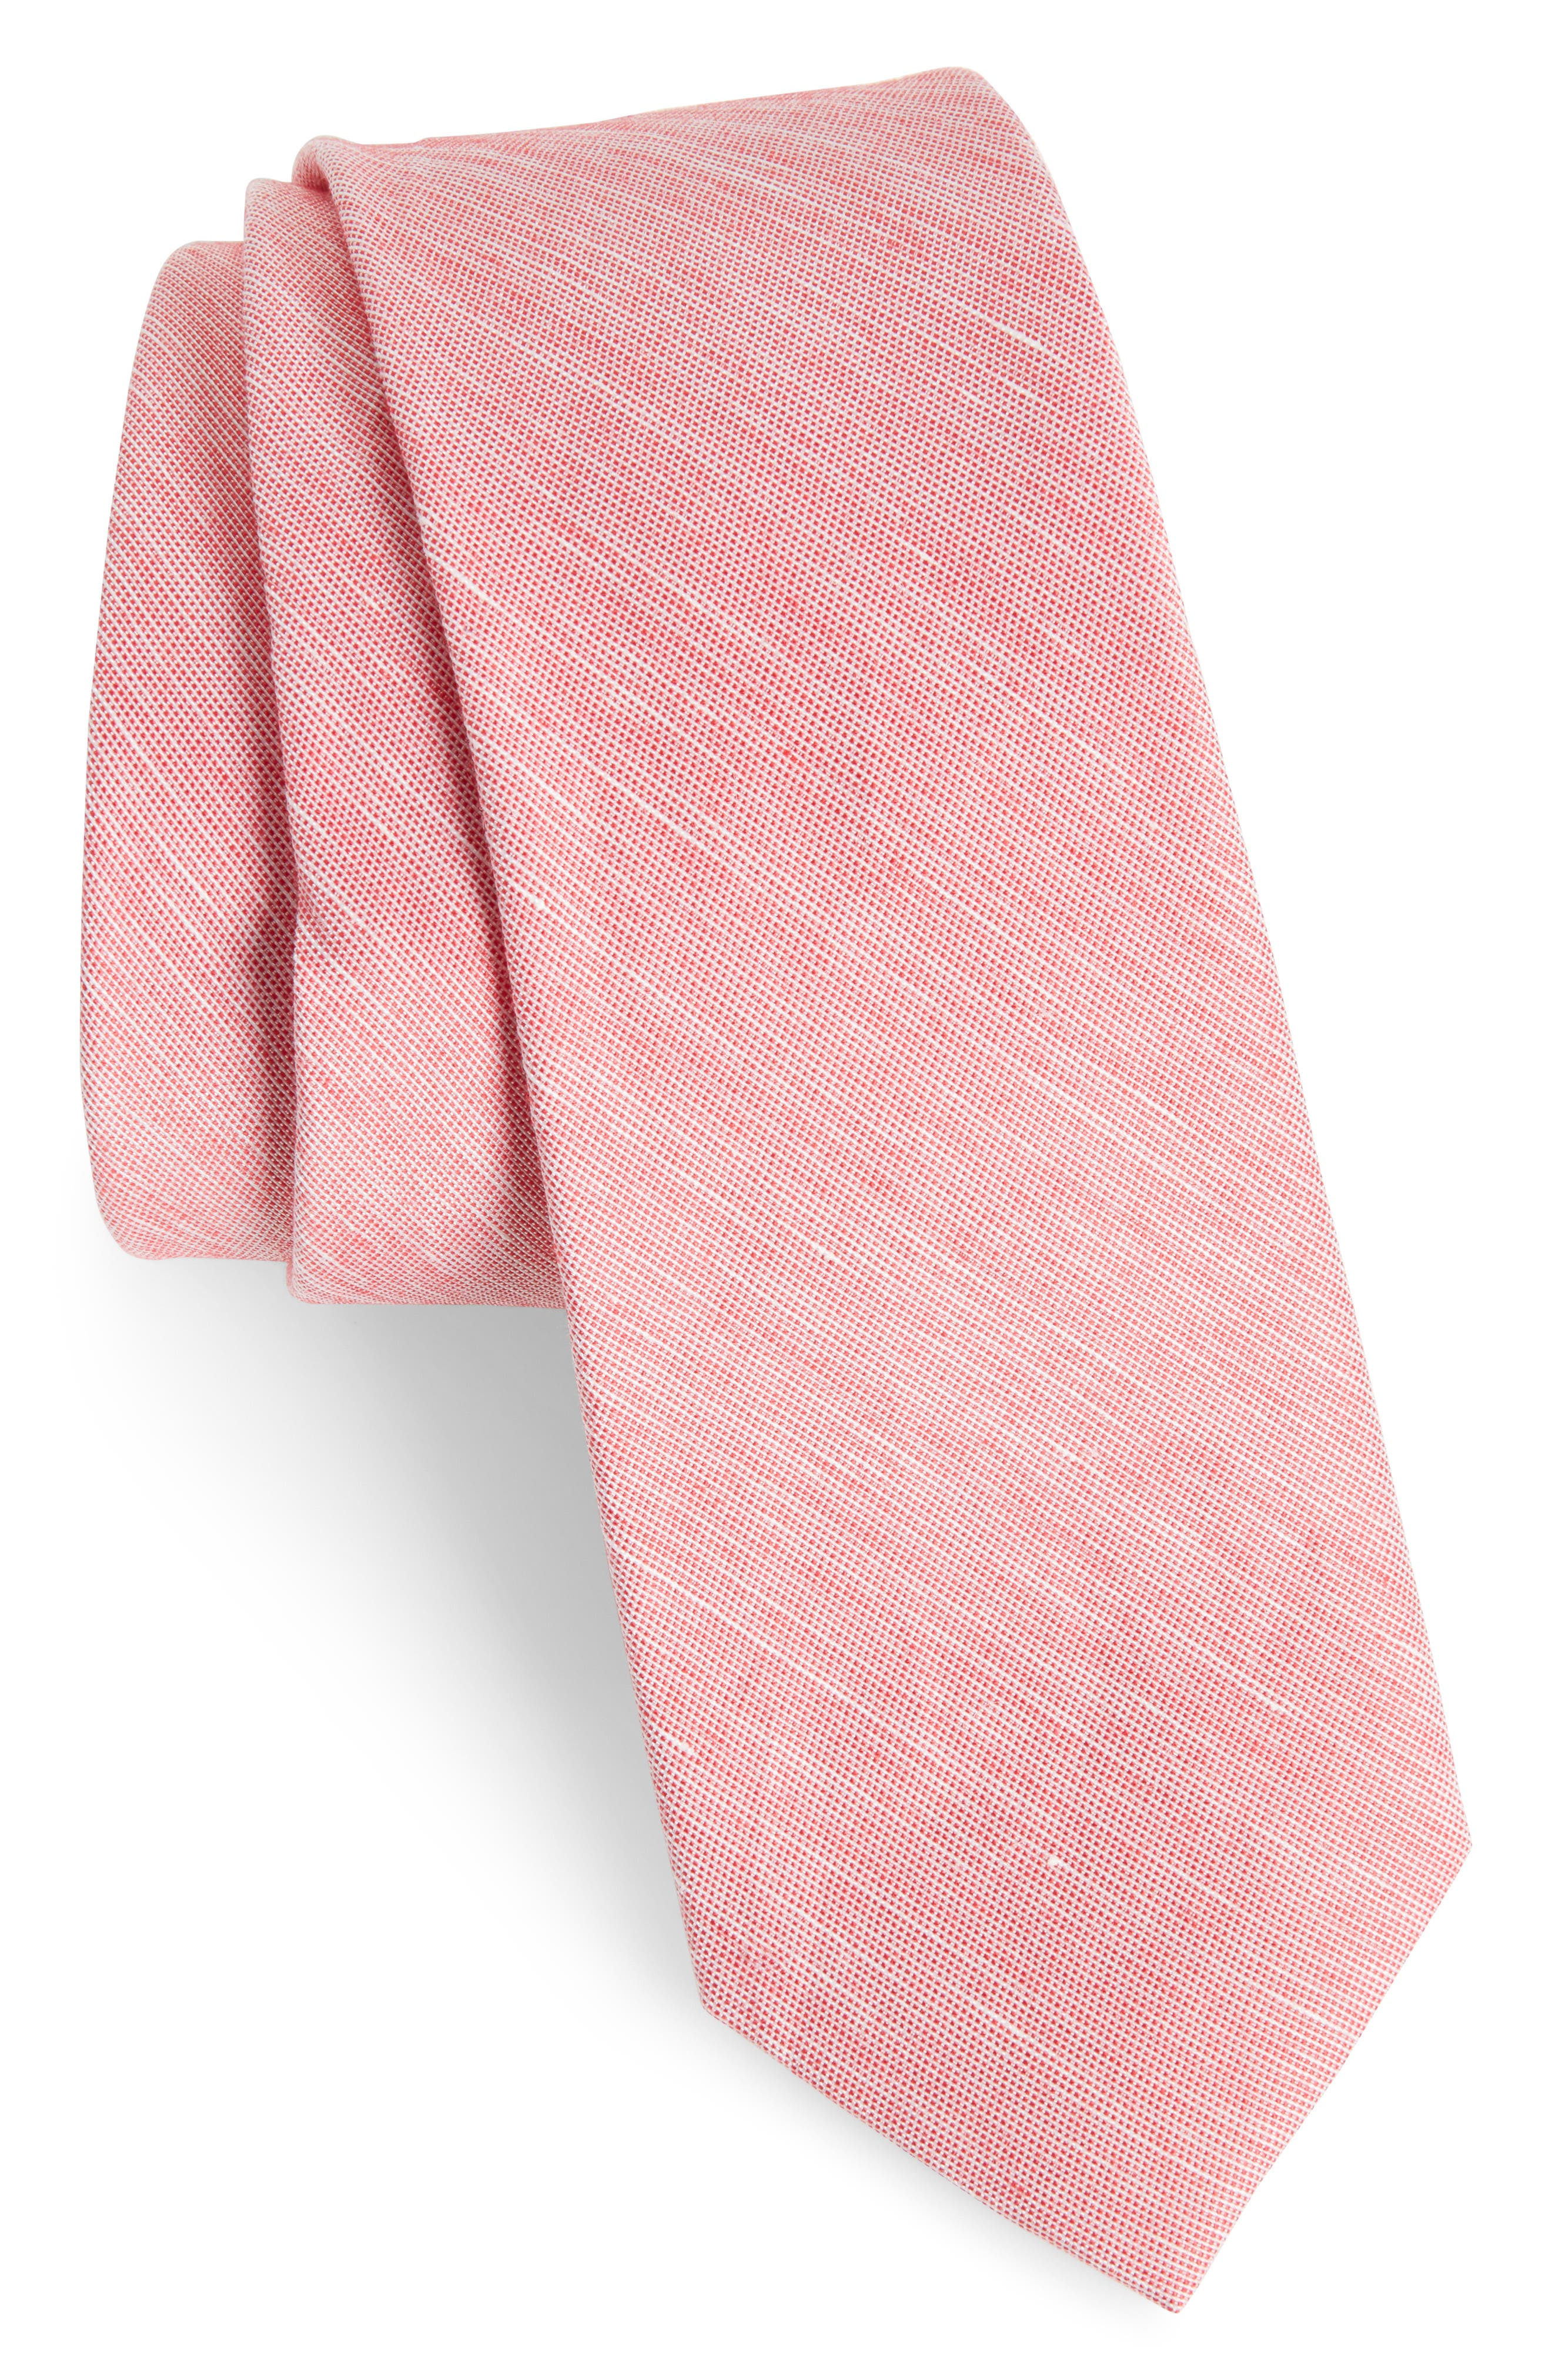 Adena Solid Silk Blend Skinny Tie,                             Main thumbnail 5, color,